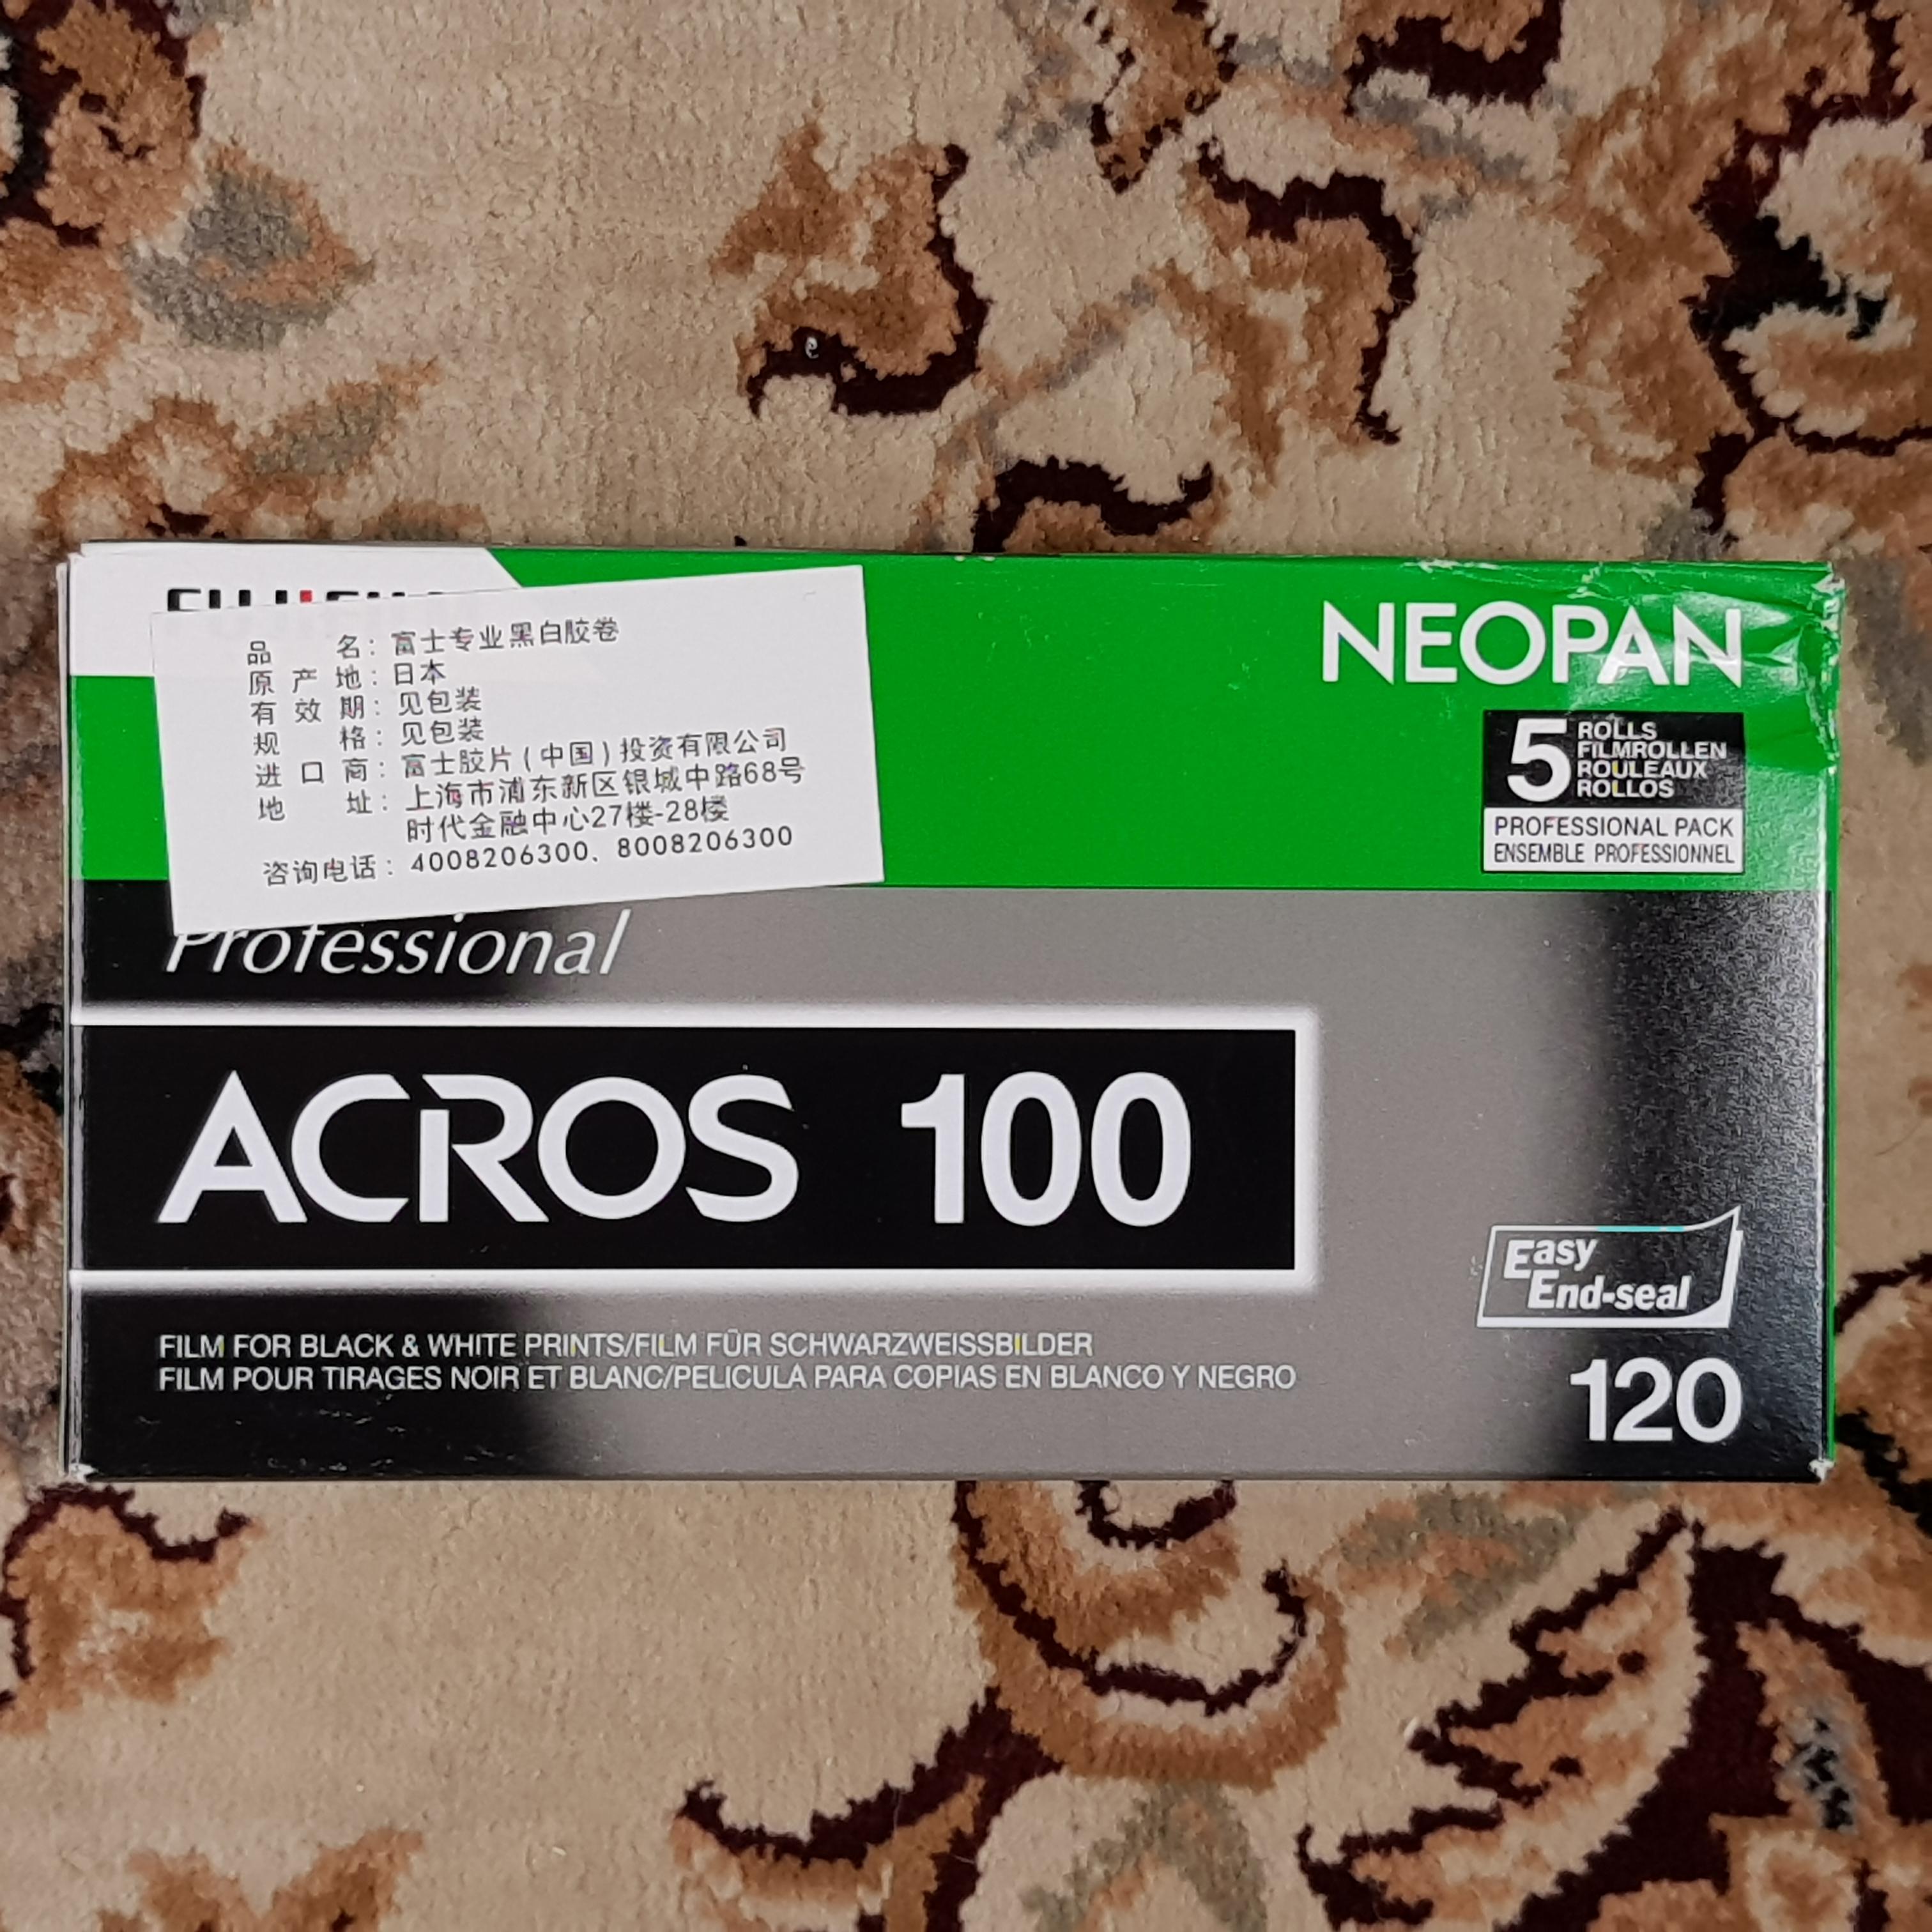 120mm Fujifilm Neopan Acros 100 Black & White Fresh Medium Format Film Roll ( iso 100 ) ( 120 format )